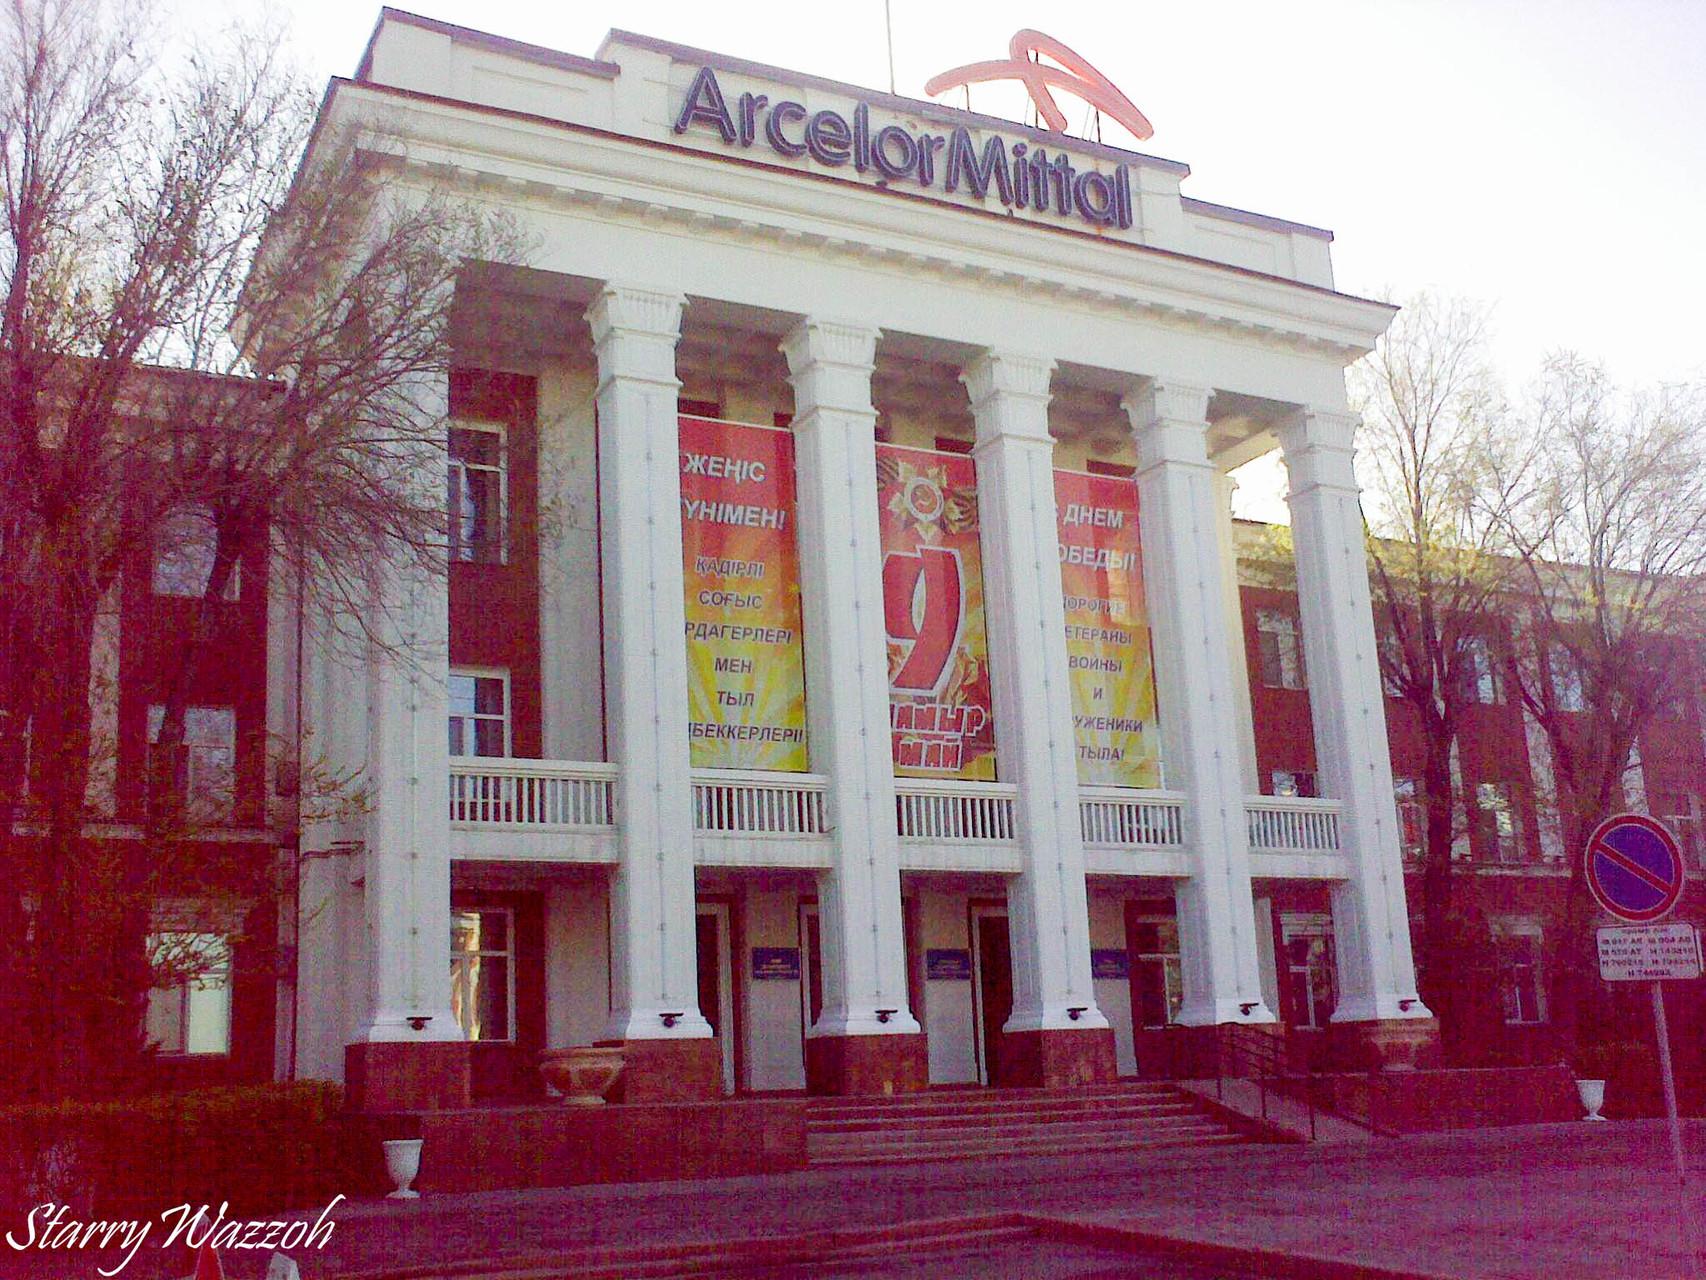 Arcelor Mittal Office, Karaganda, Kazakhstan 2013